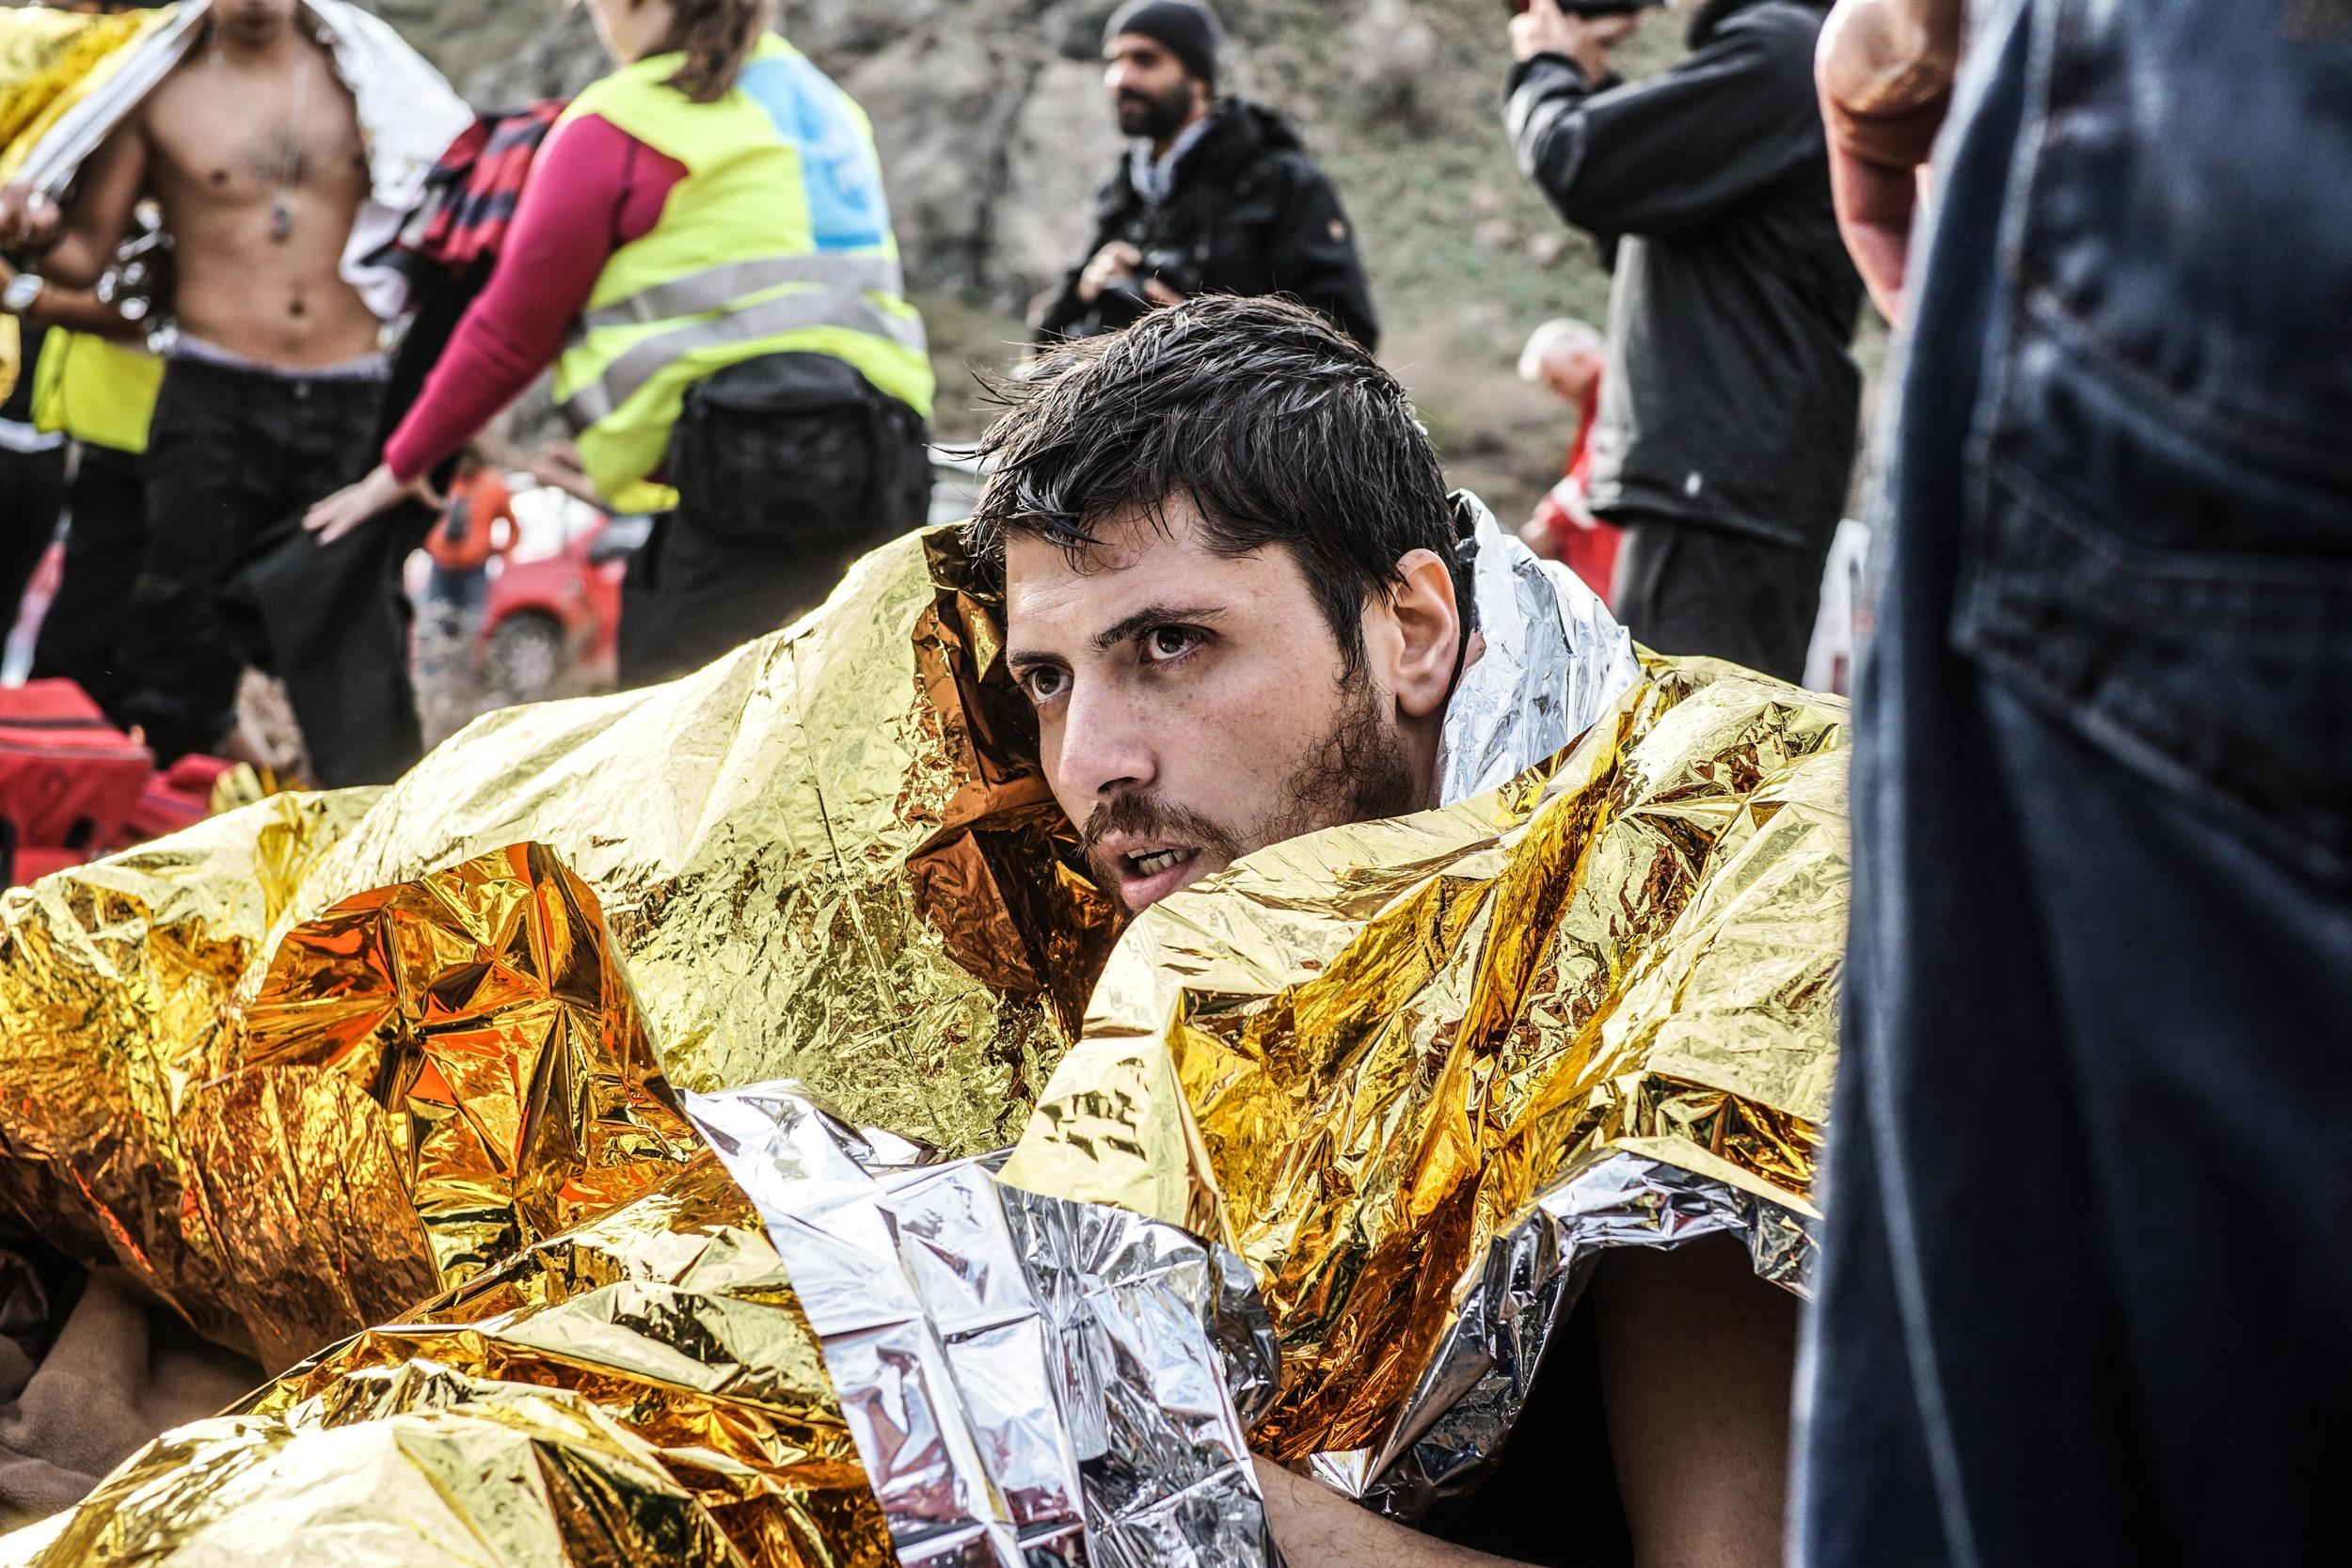 Syrian Refugee Crisis Lesbos Greece November 2015 29.jpg